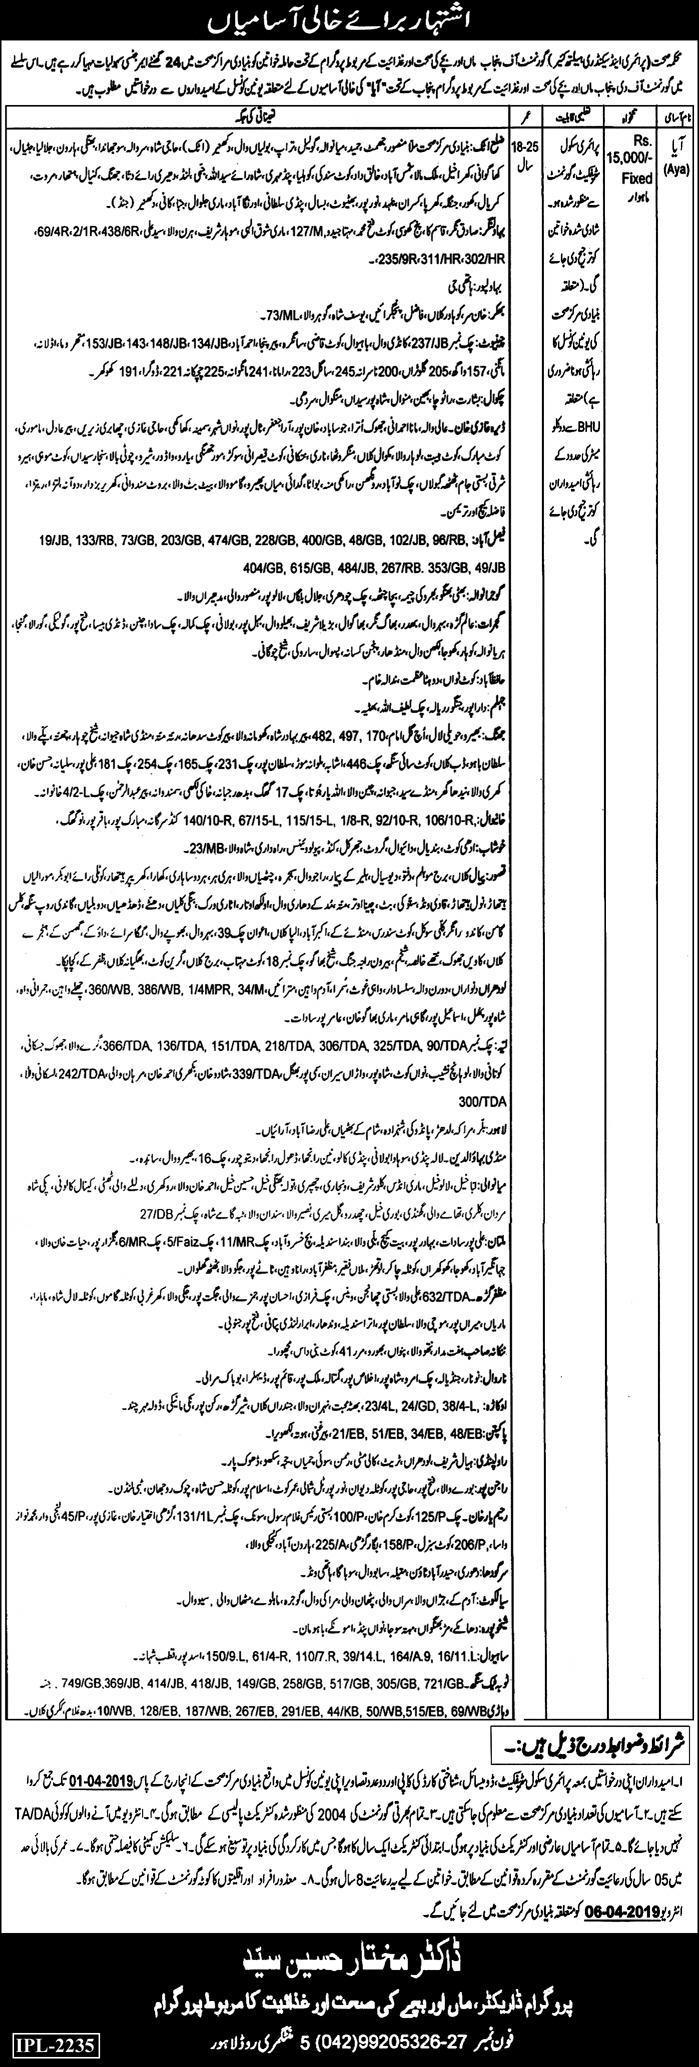 Health Department Aya Job in Punjab 2019 Health Department Jobs in